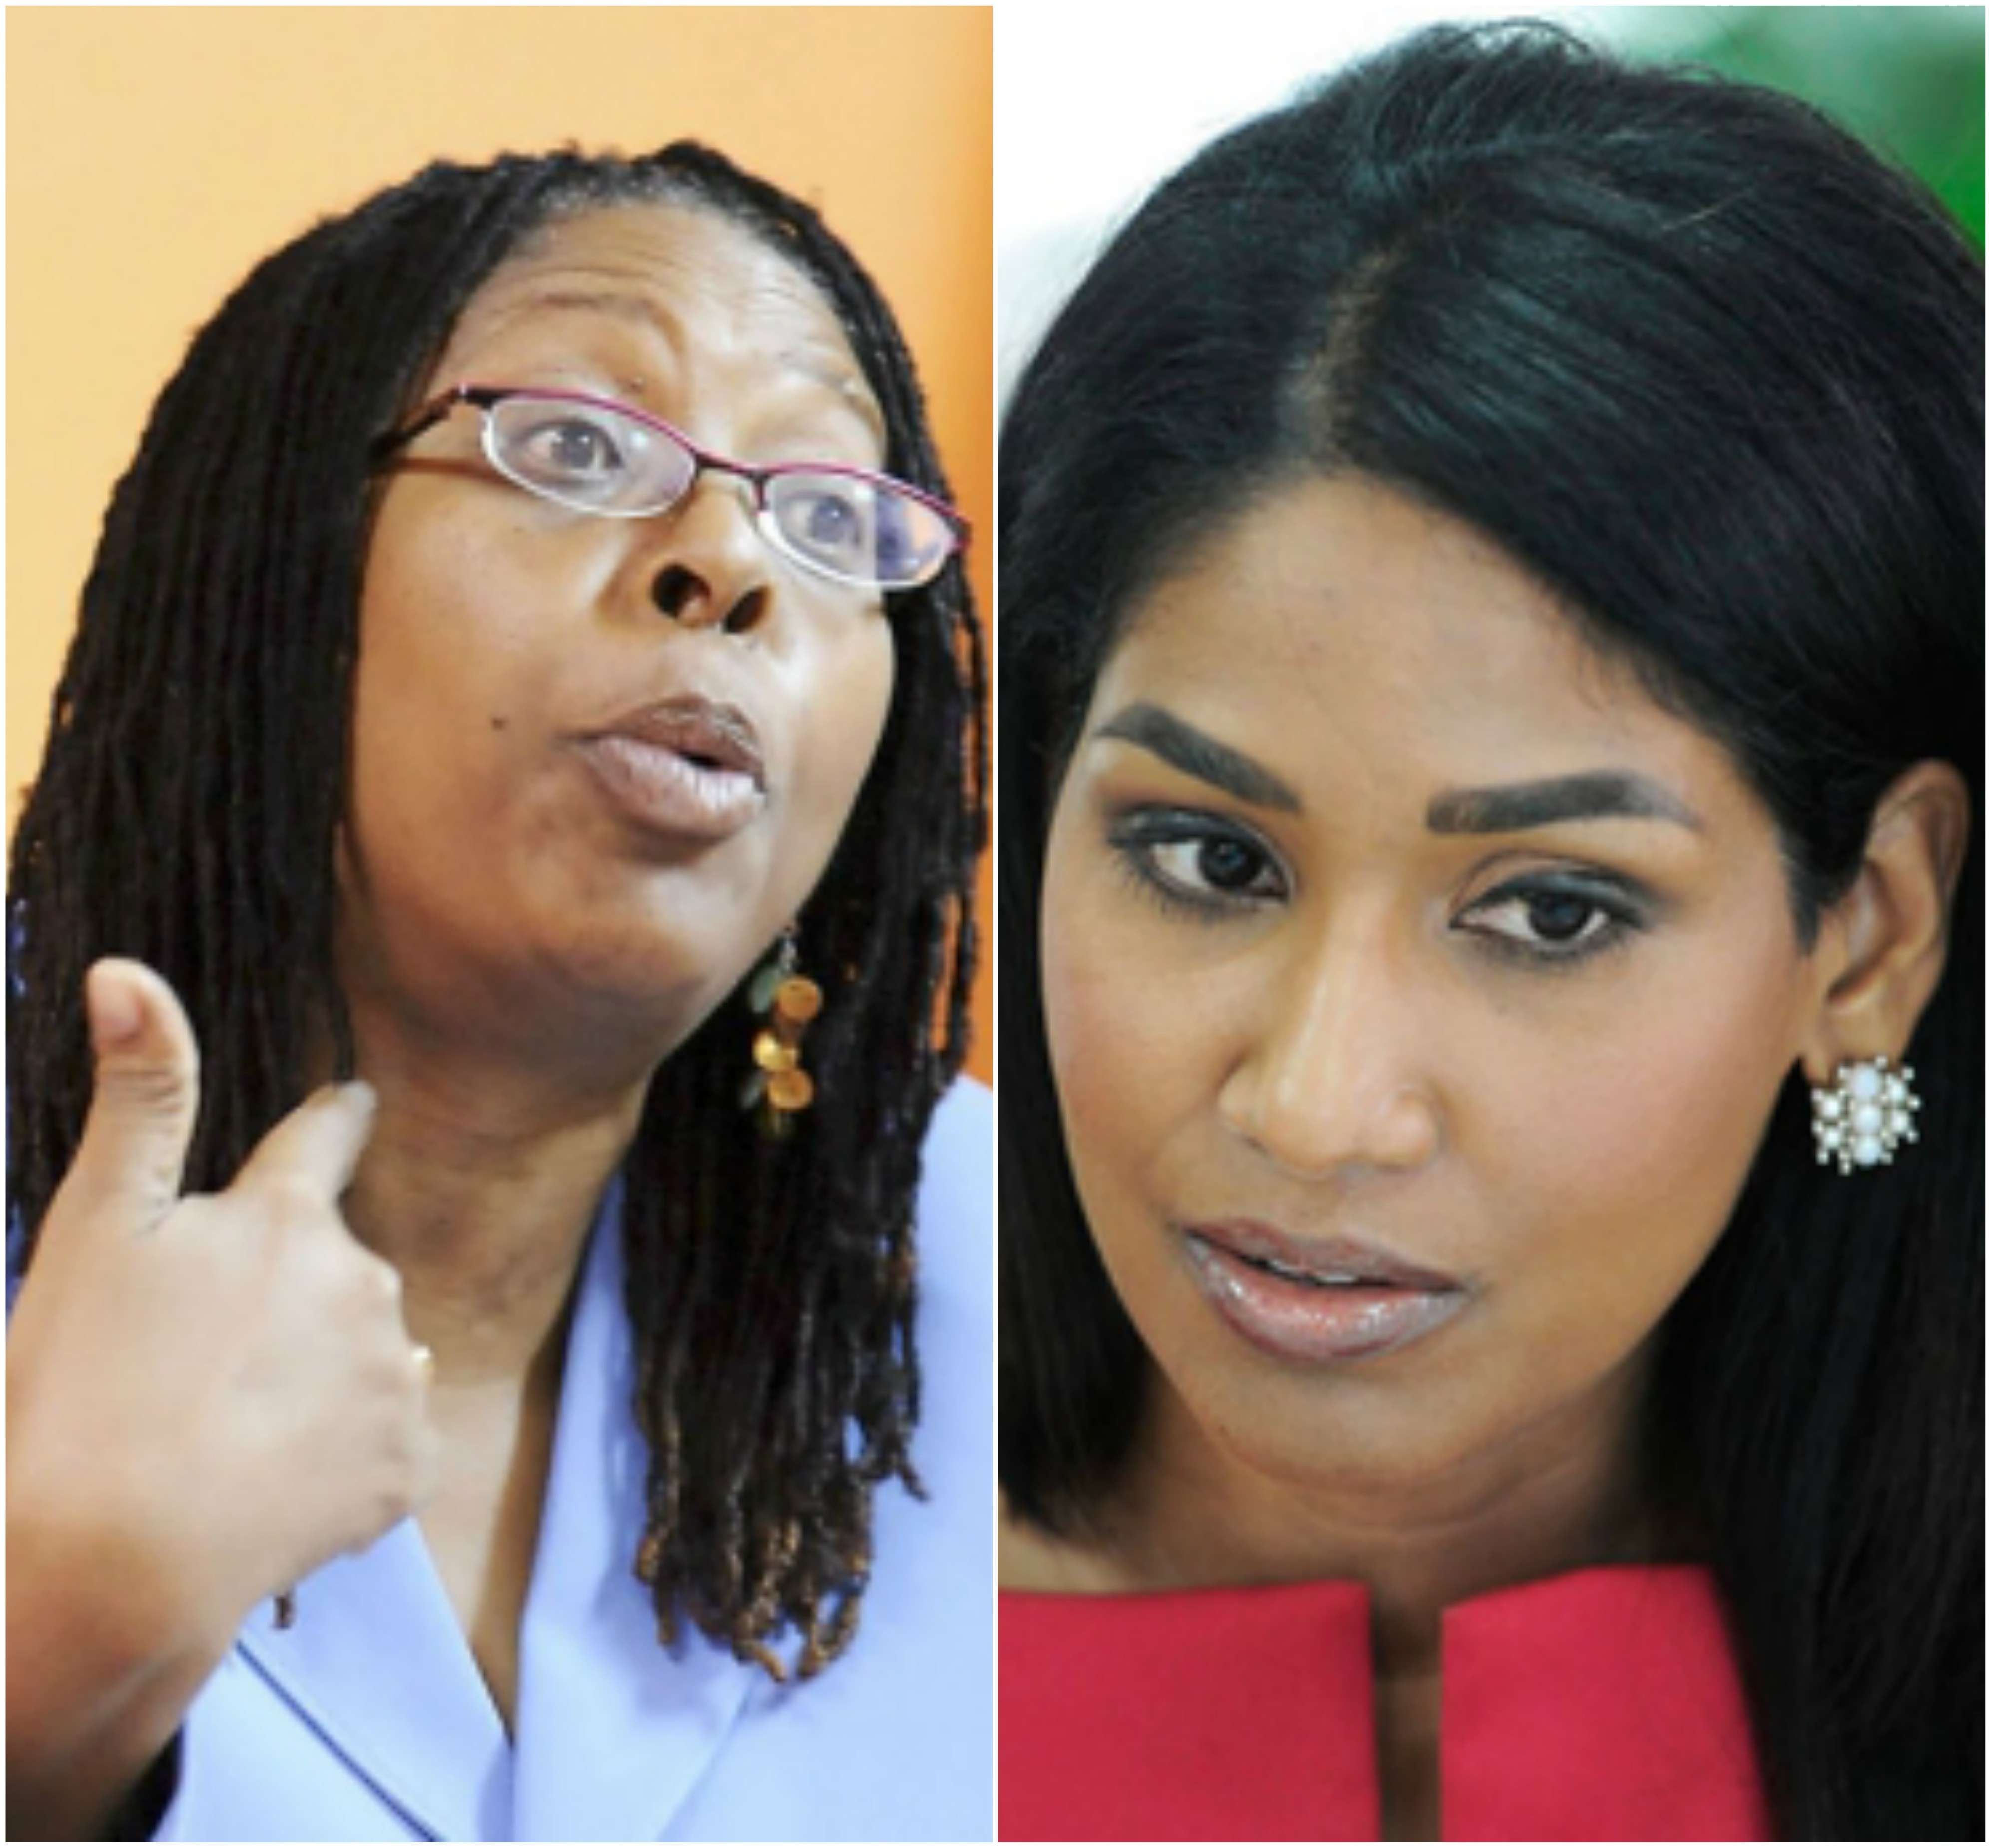 Brown-Burke Seeking Re-Election; Defends 'Backstabbing' Re-Post